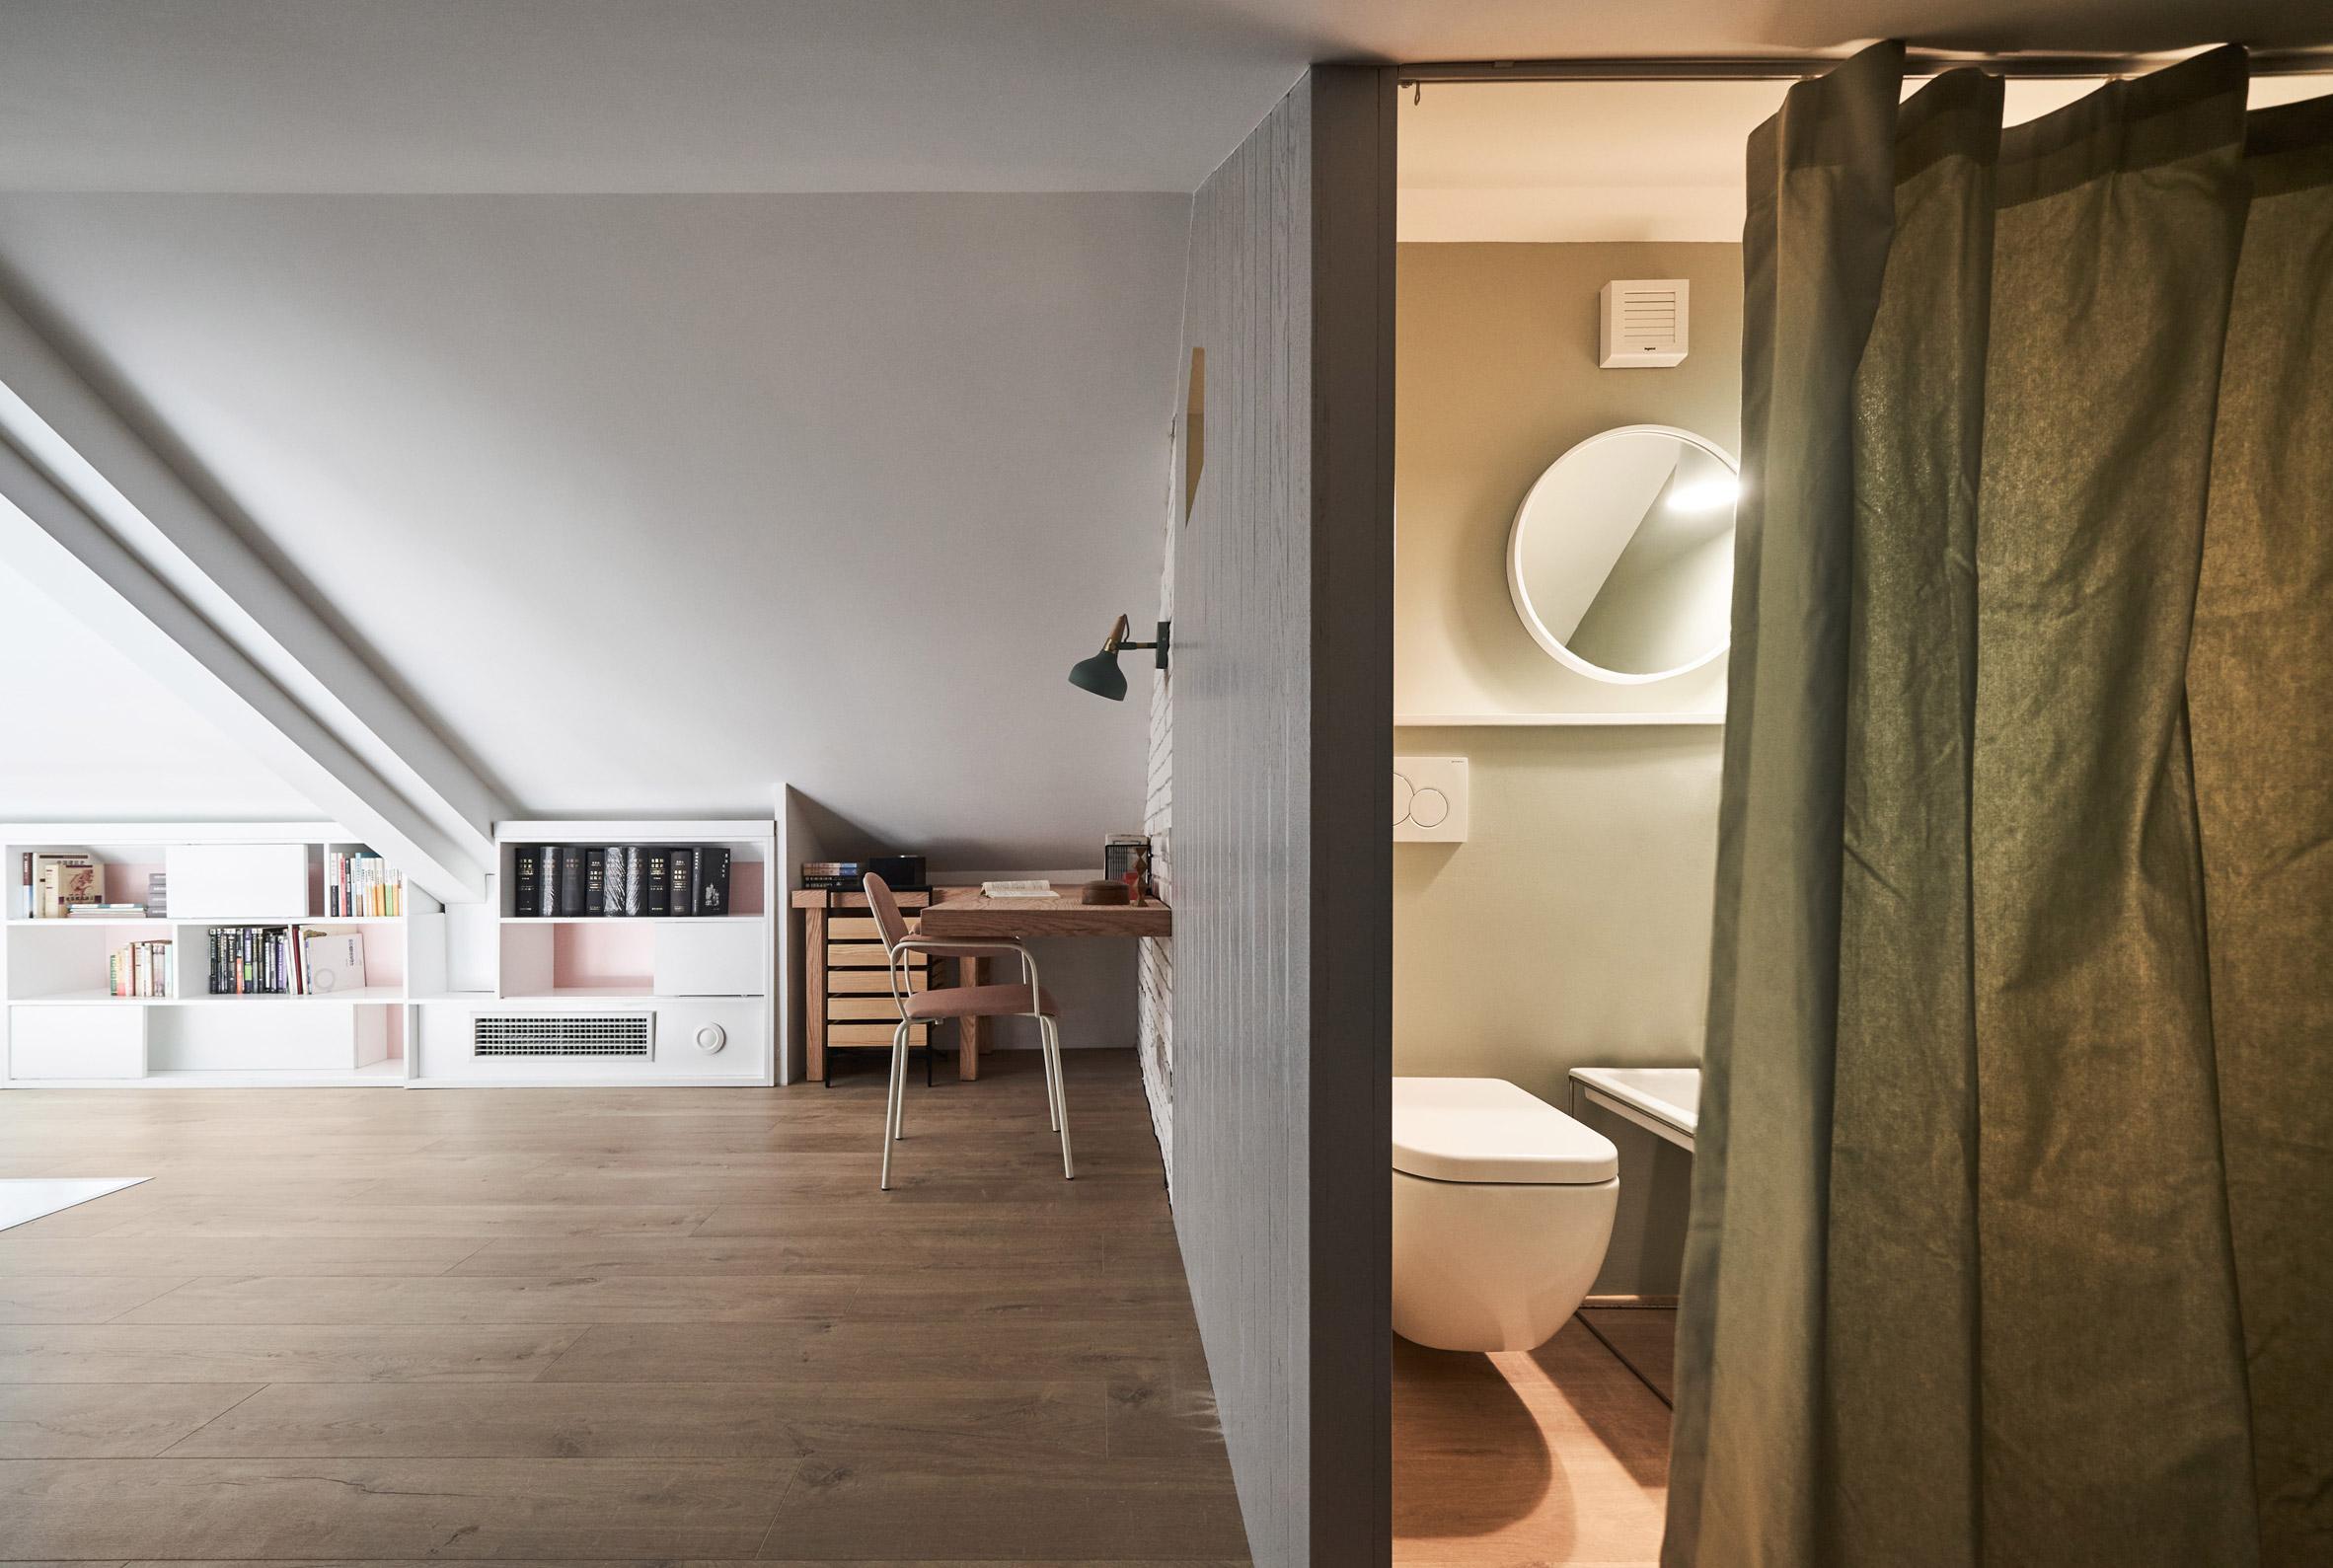 căn hộ cho gia đình trẻ starburst-house-hao-design-interiors-residential-china-beijing-elledecoration vietnam 13